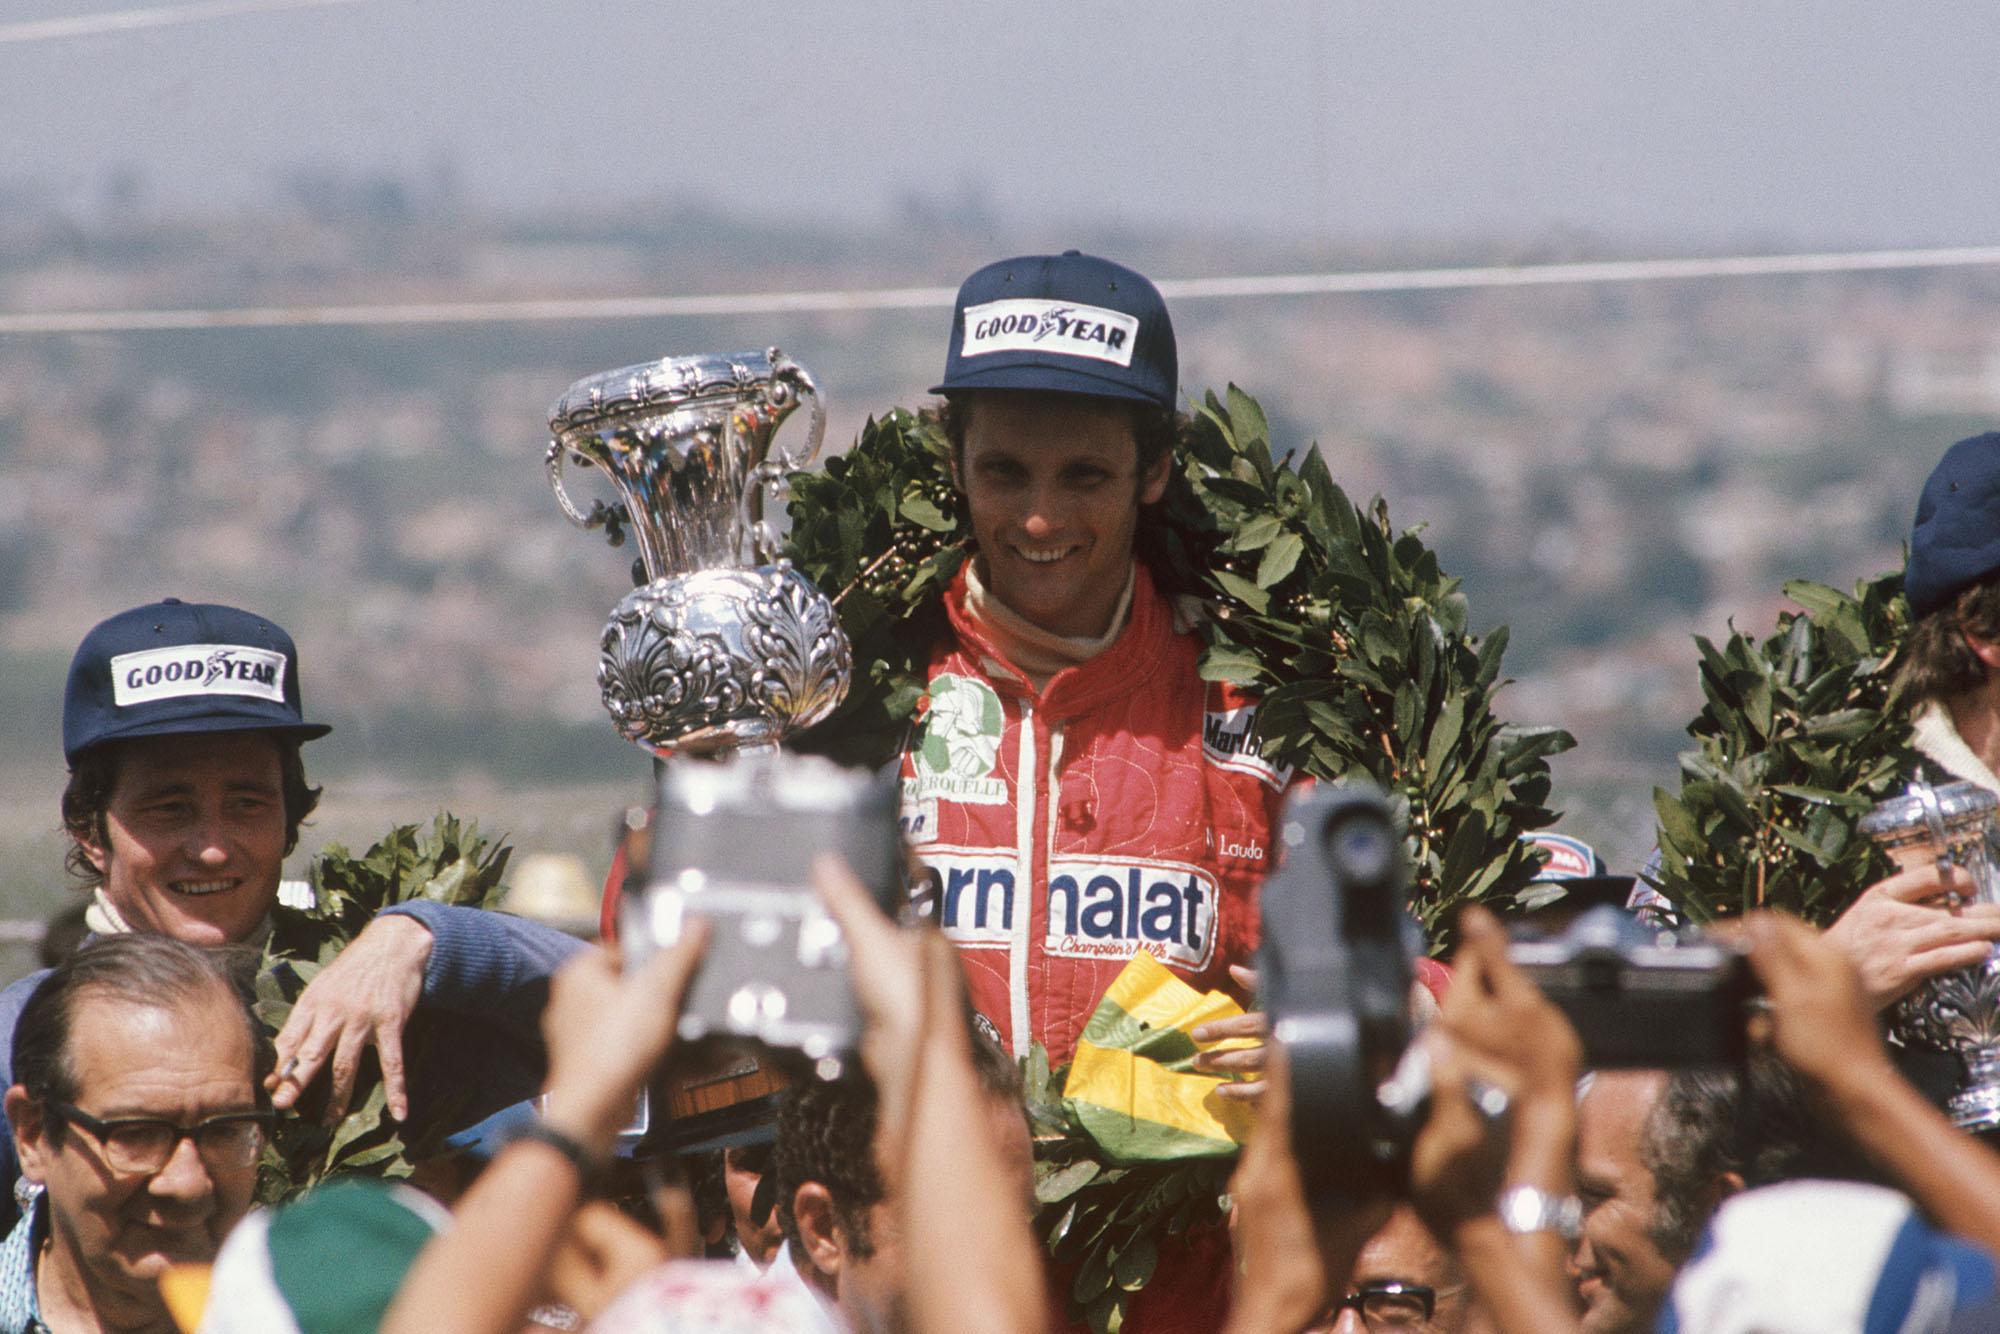 Niki Lauda stands atop the podium after winning the 1976 Brazilian Grand Prix